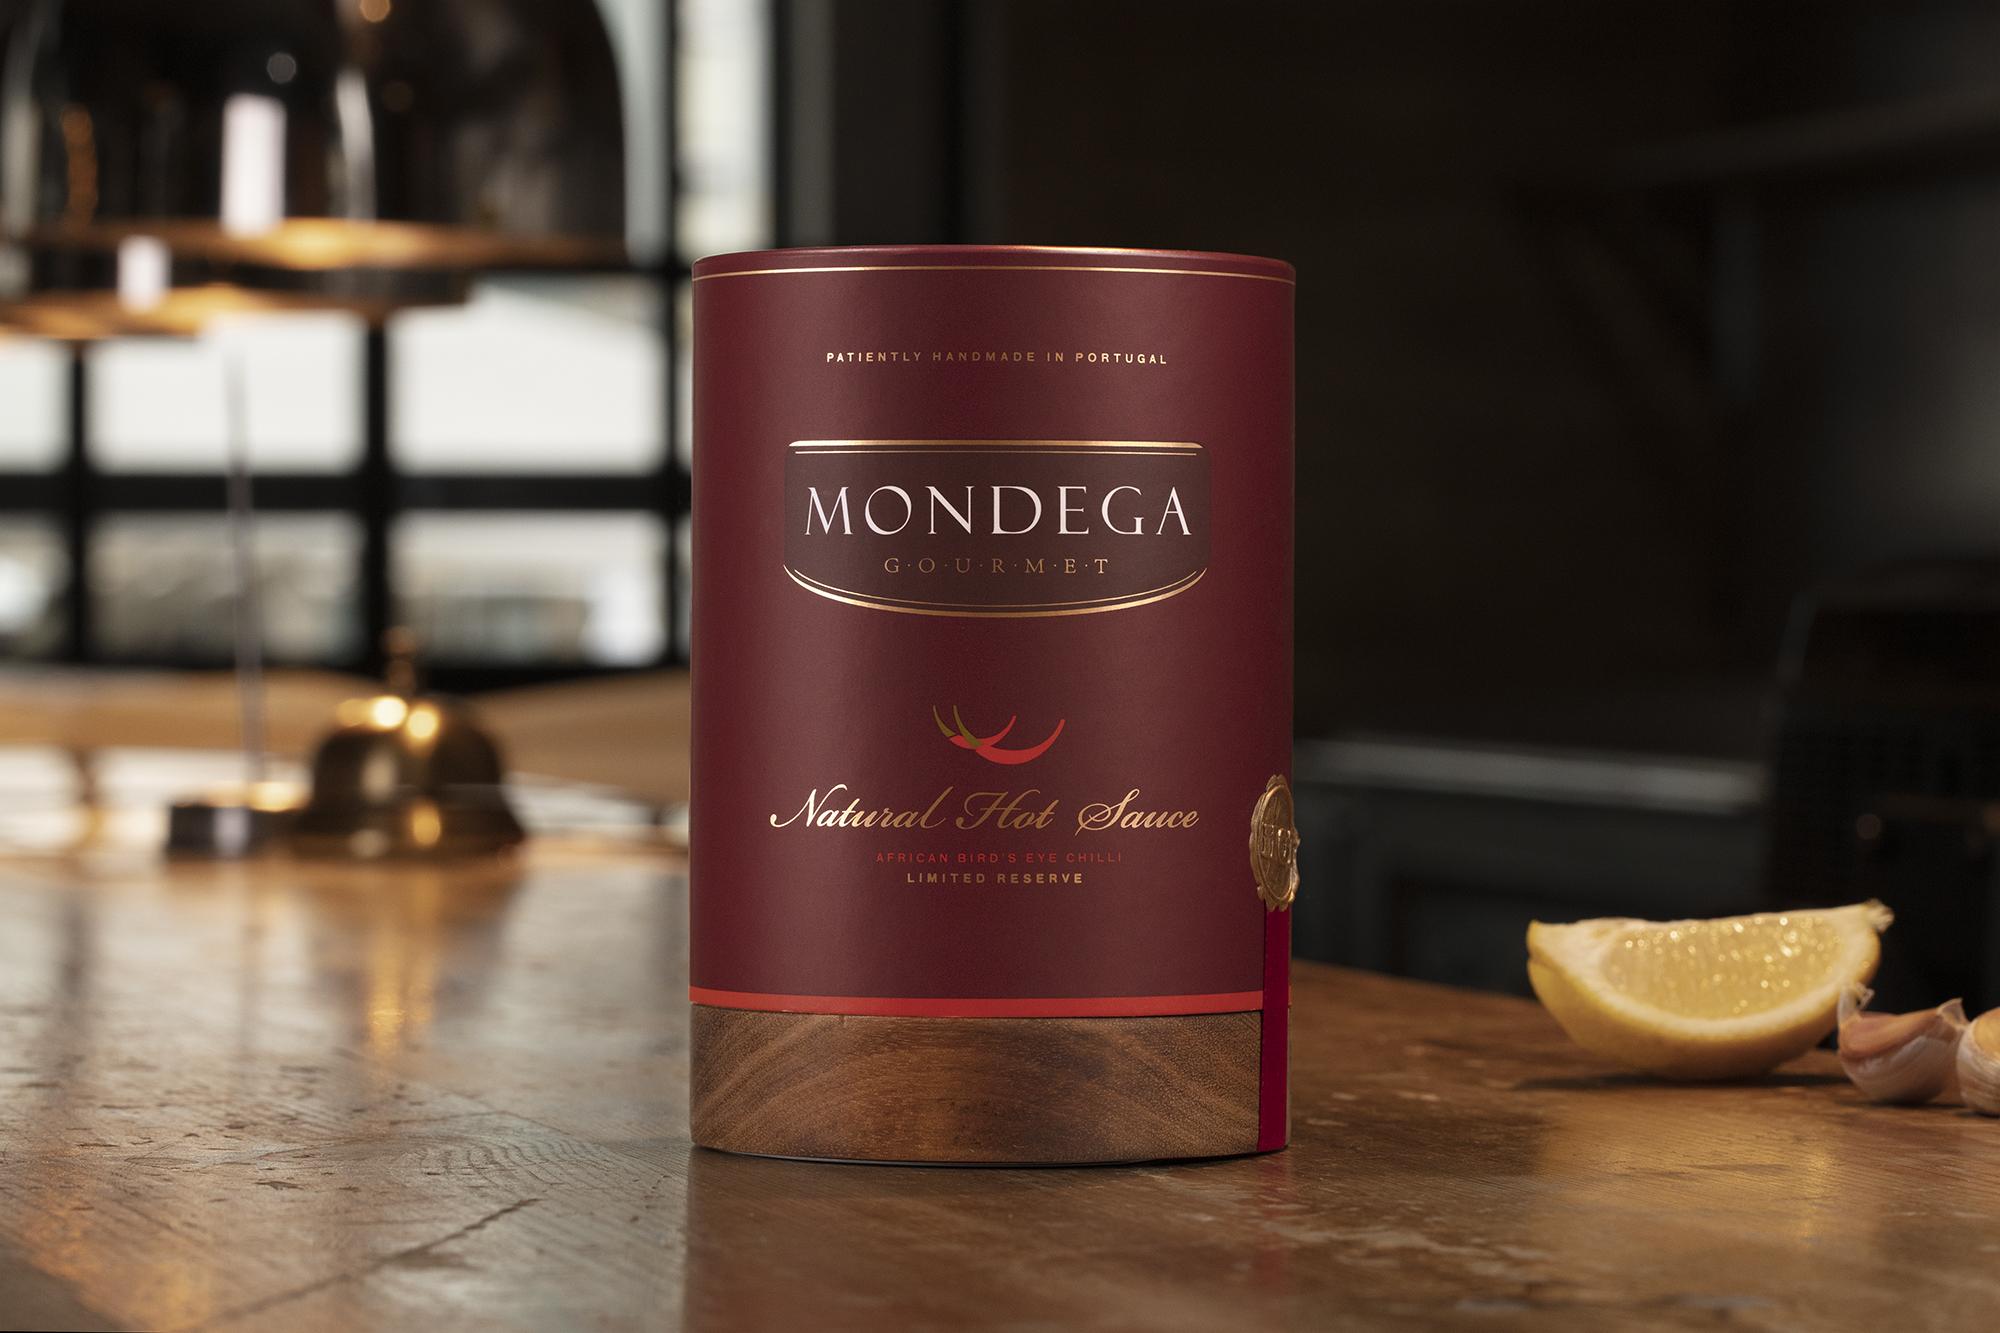 Mondega Gourmet Natural Hot Sauce